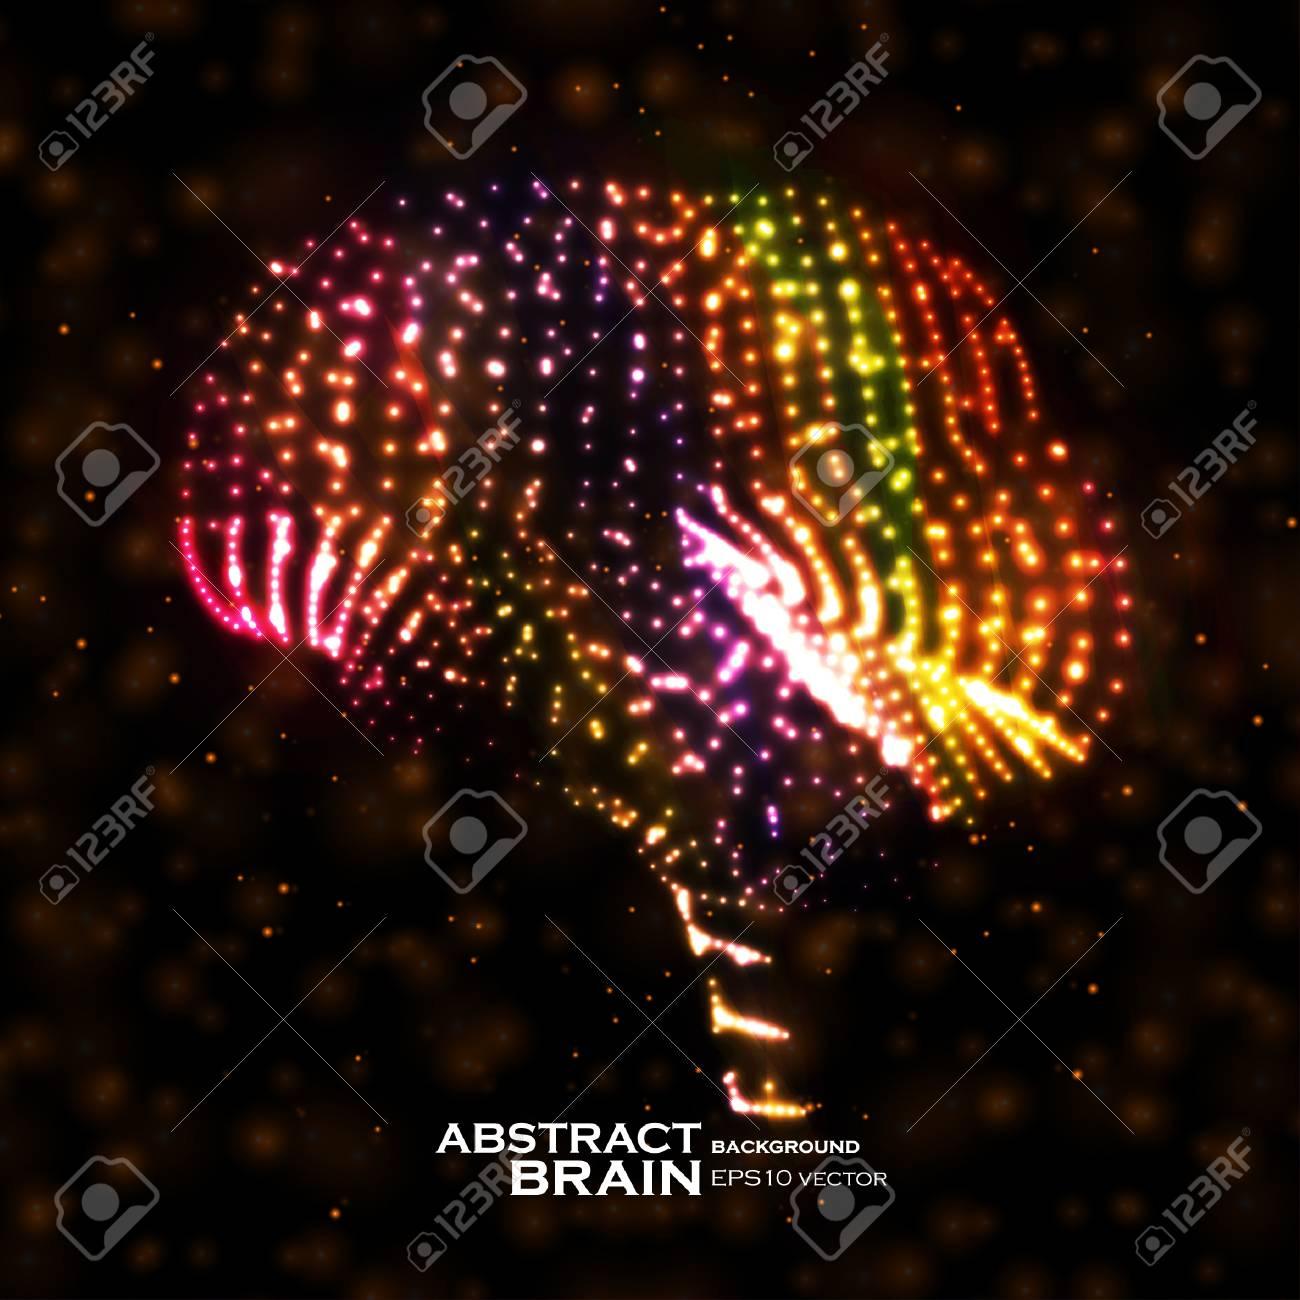 Neon brain, abstract vector illustration, bright elements - editable eps10 Stock Vector - 19968197